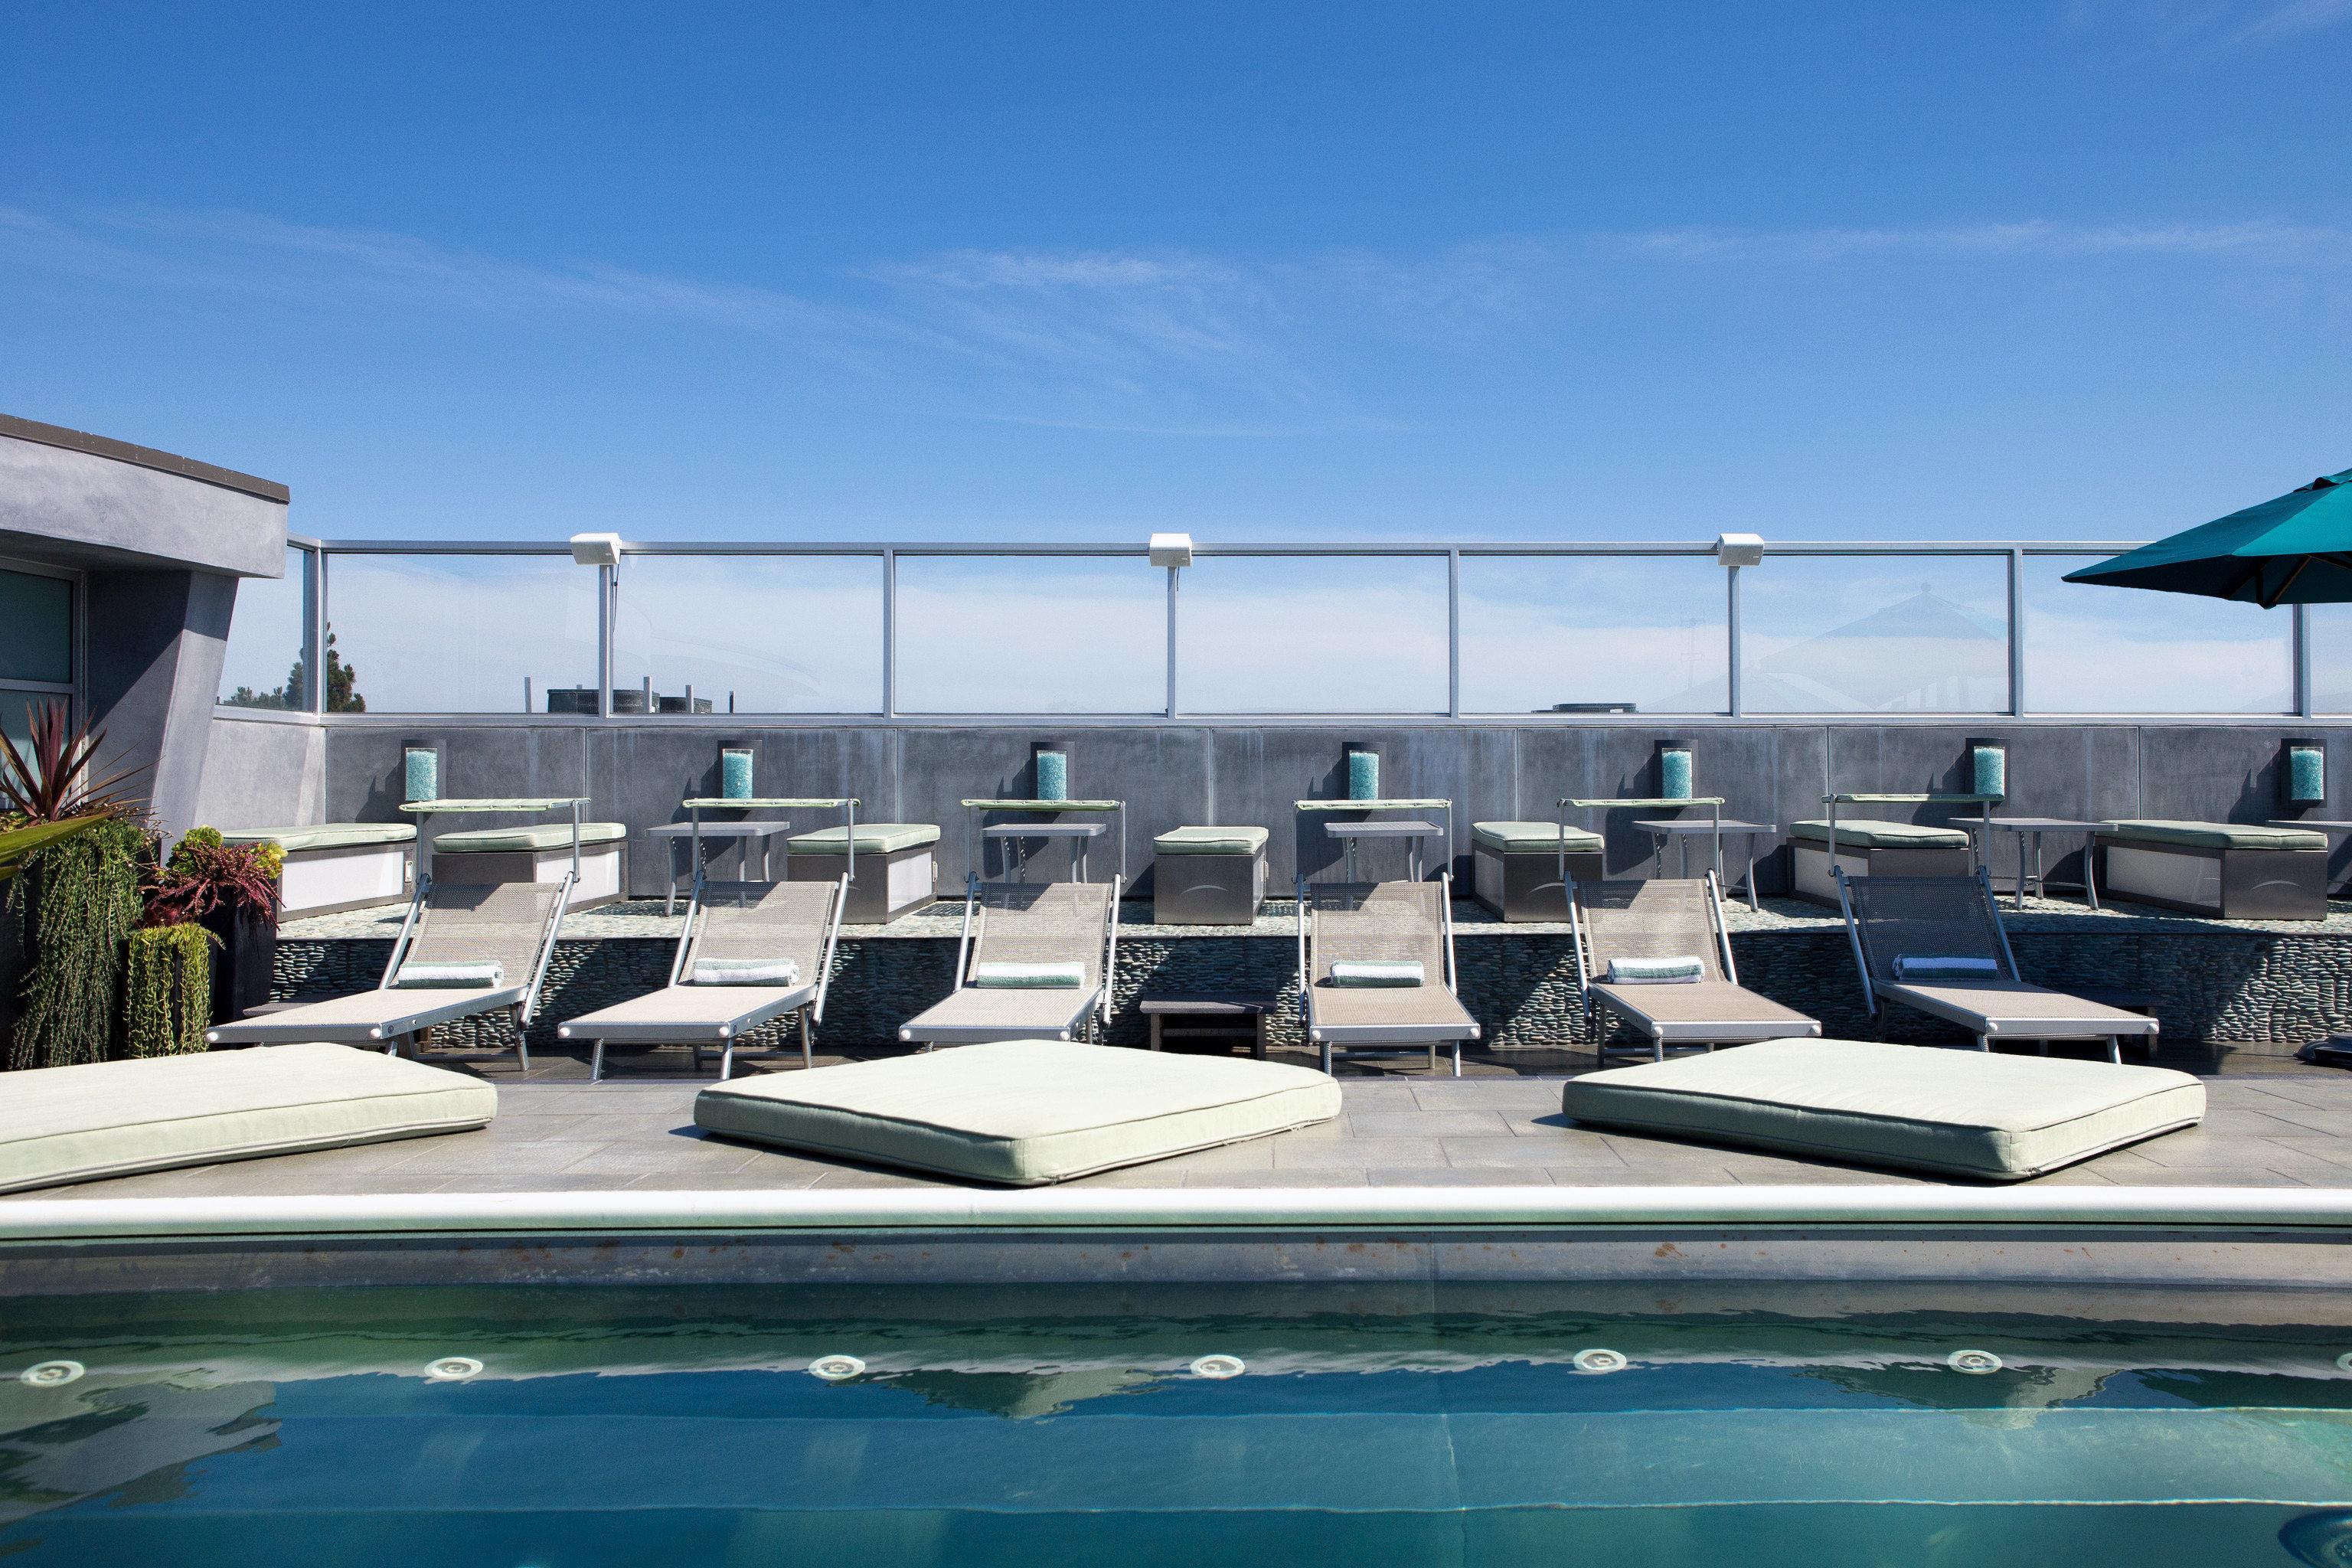 Hip Lounge Luxury Pool sky swimming pool property Architecture daylighting condominium headquarters marina